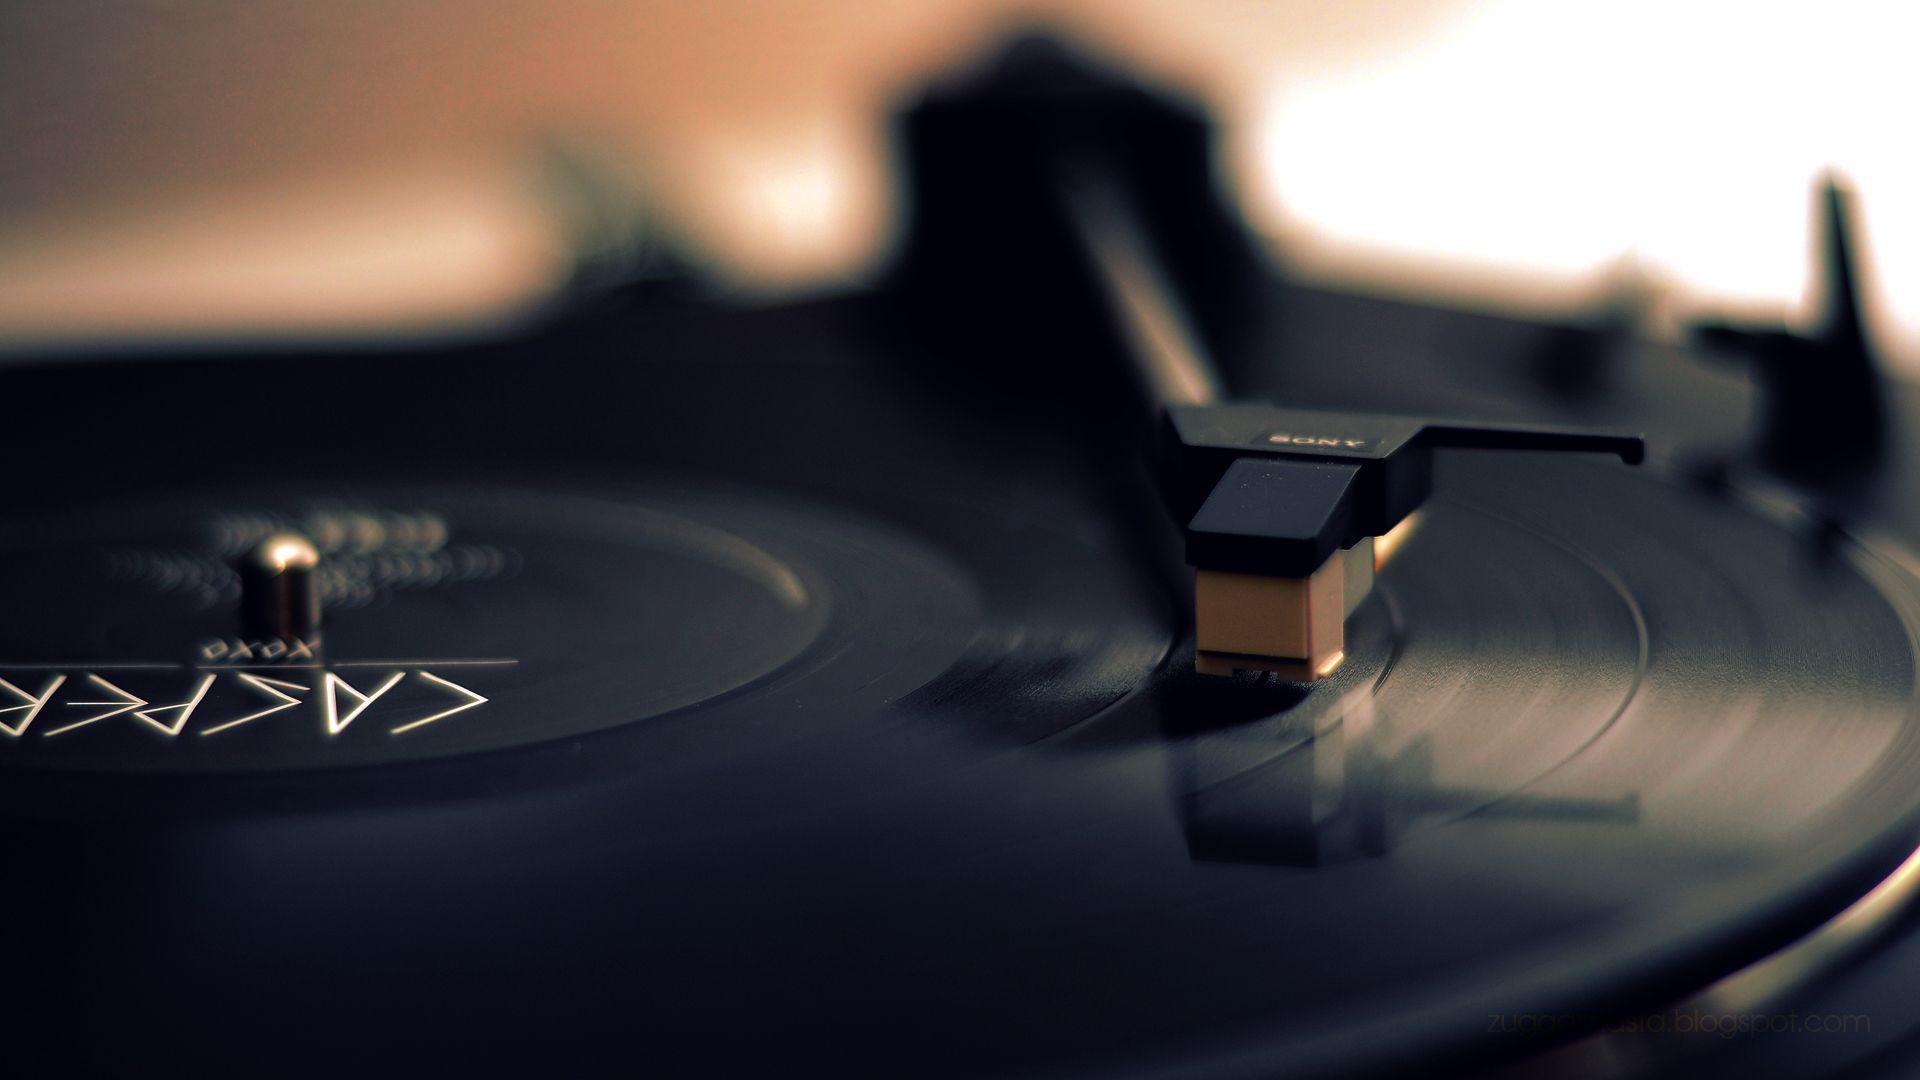 Wallpaper Facebook Cover Photos Vintage Vinyl Record Player Vintage Vinyl Record Player